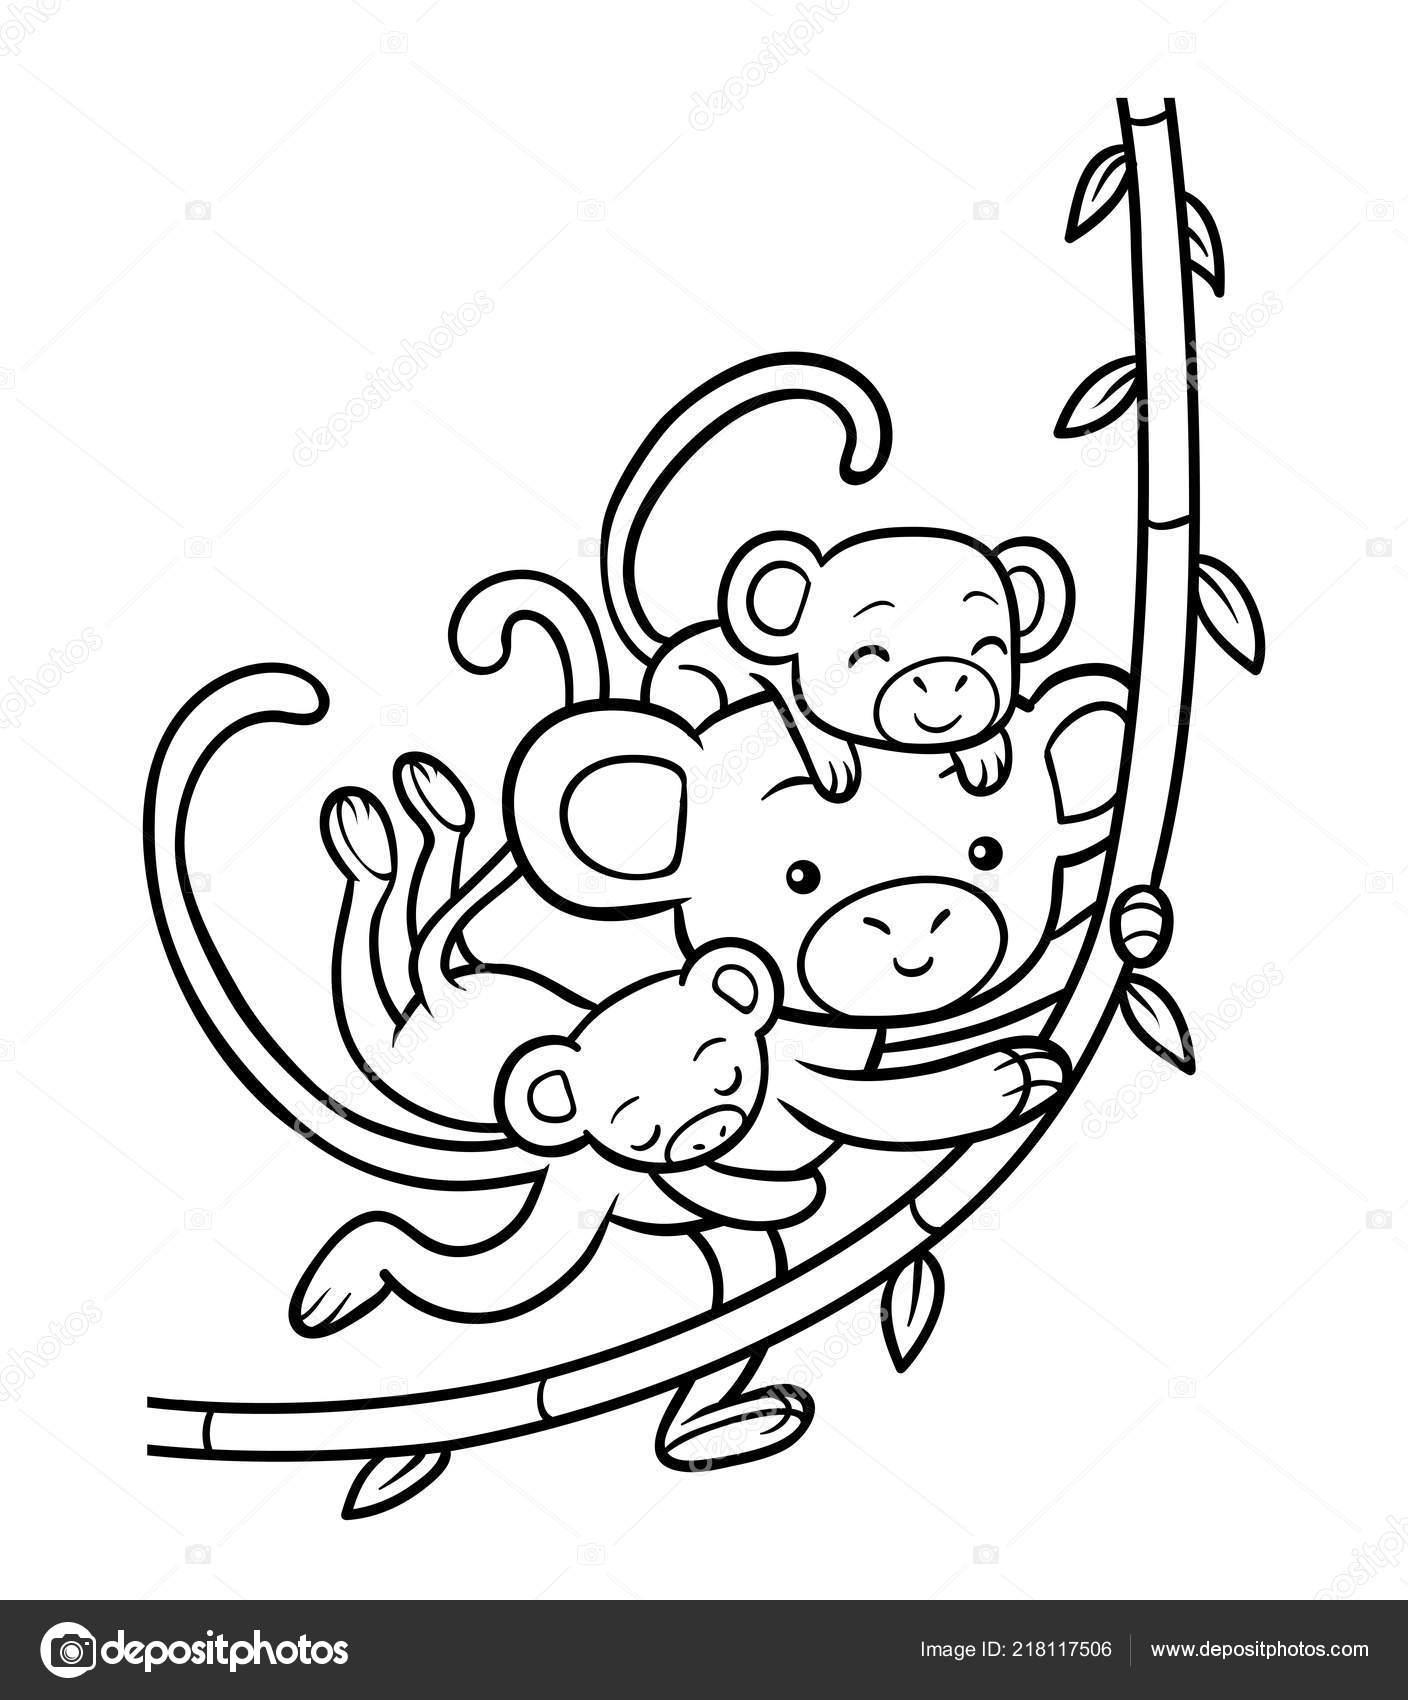 Libro Colorear Para Niños Familia Monos Vector De Stock